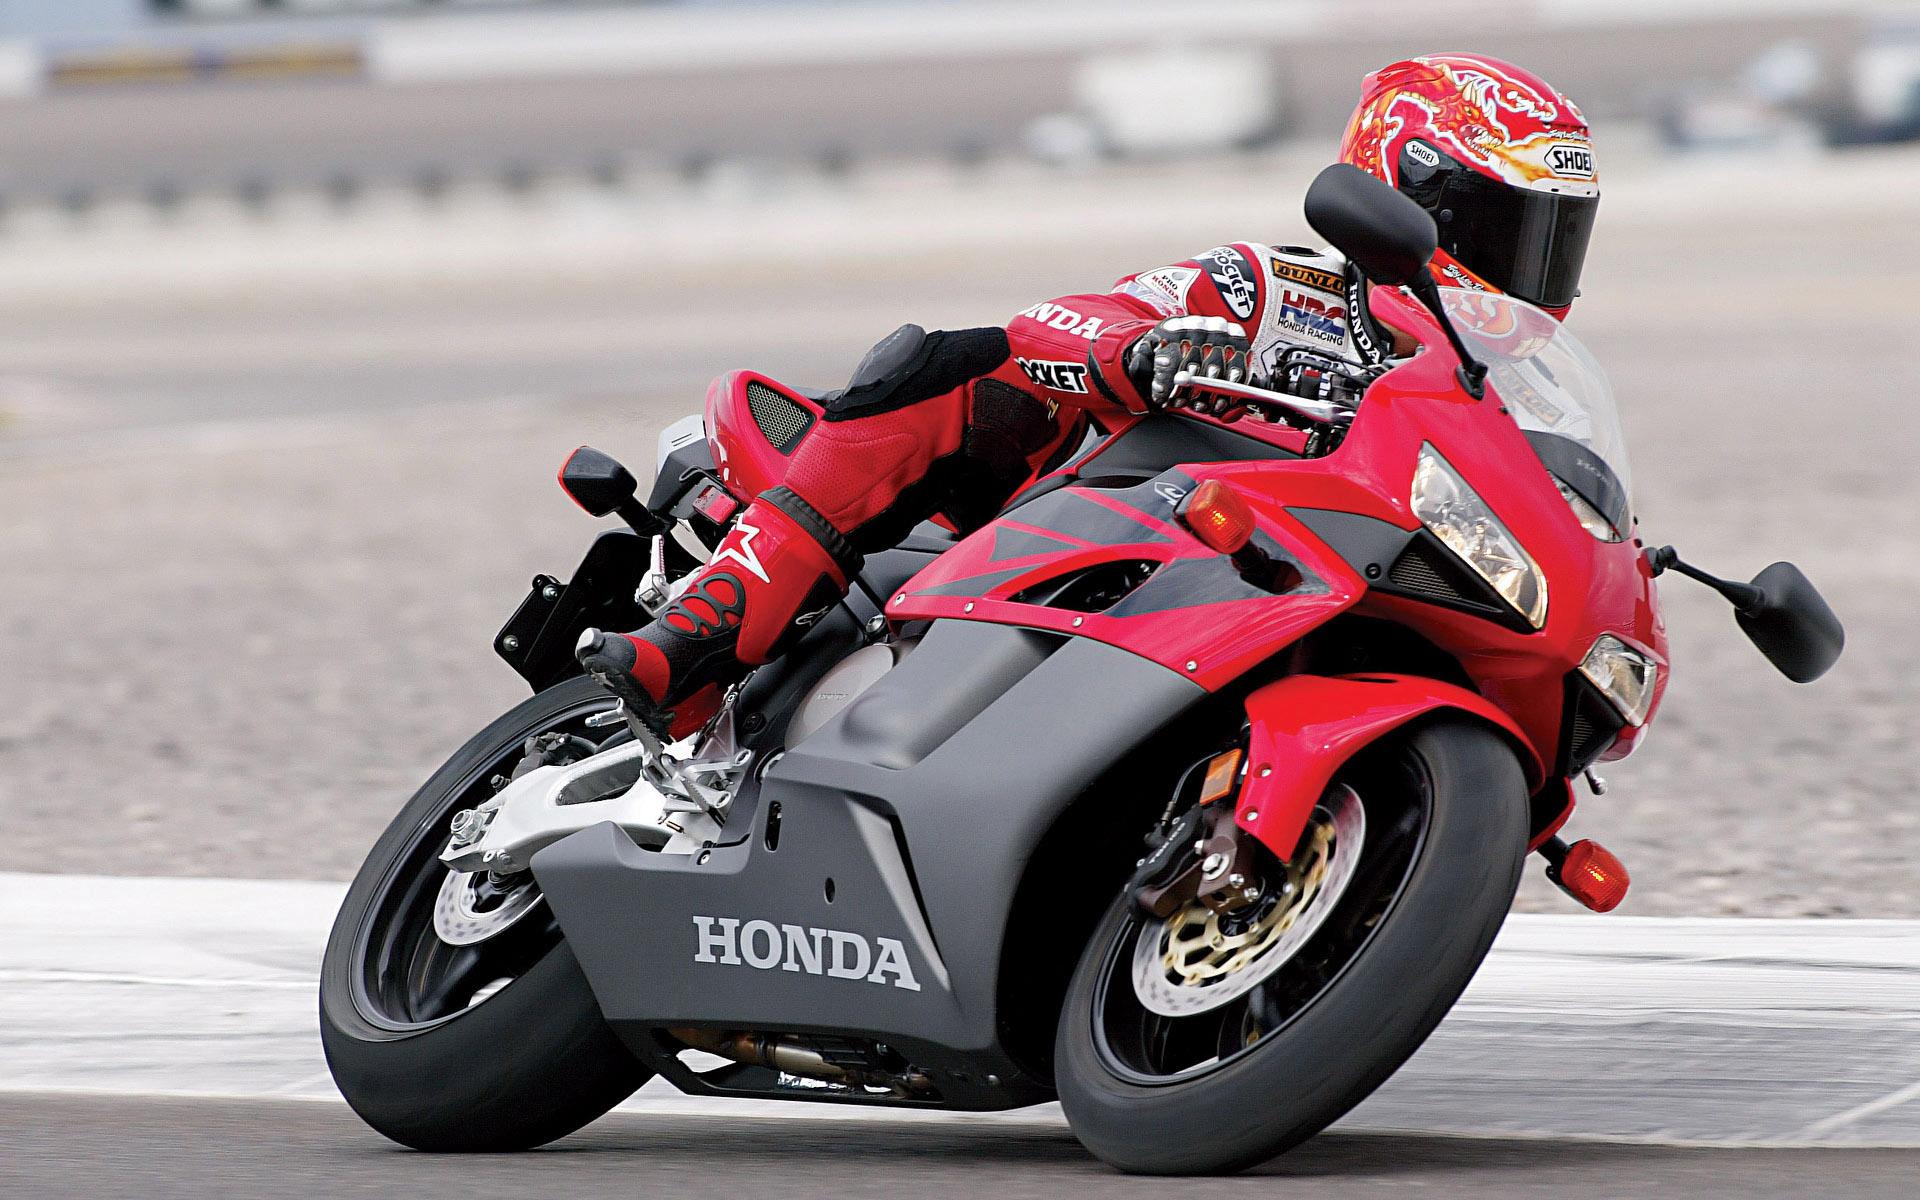 фото мотоциклов для начинающих